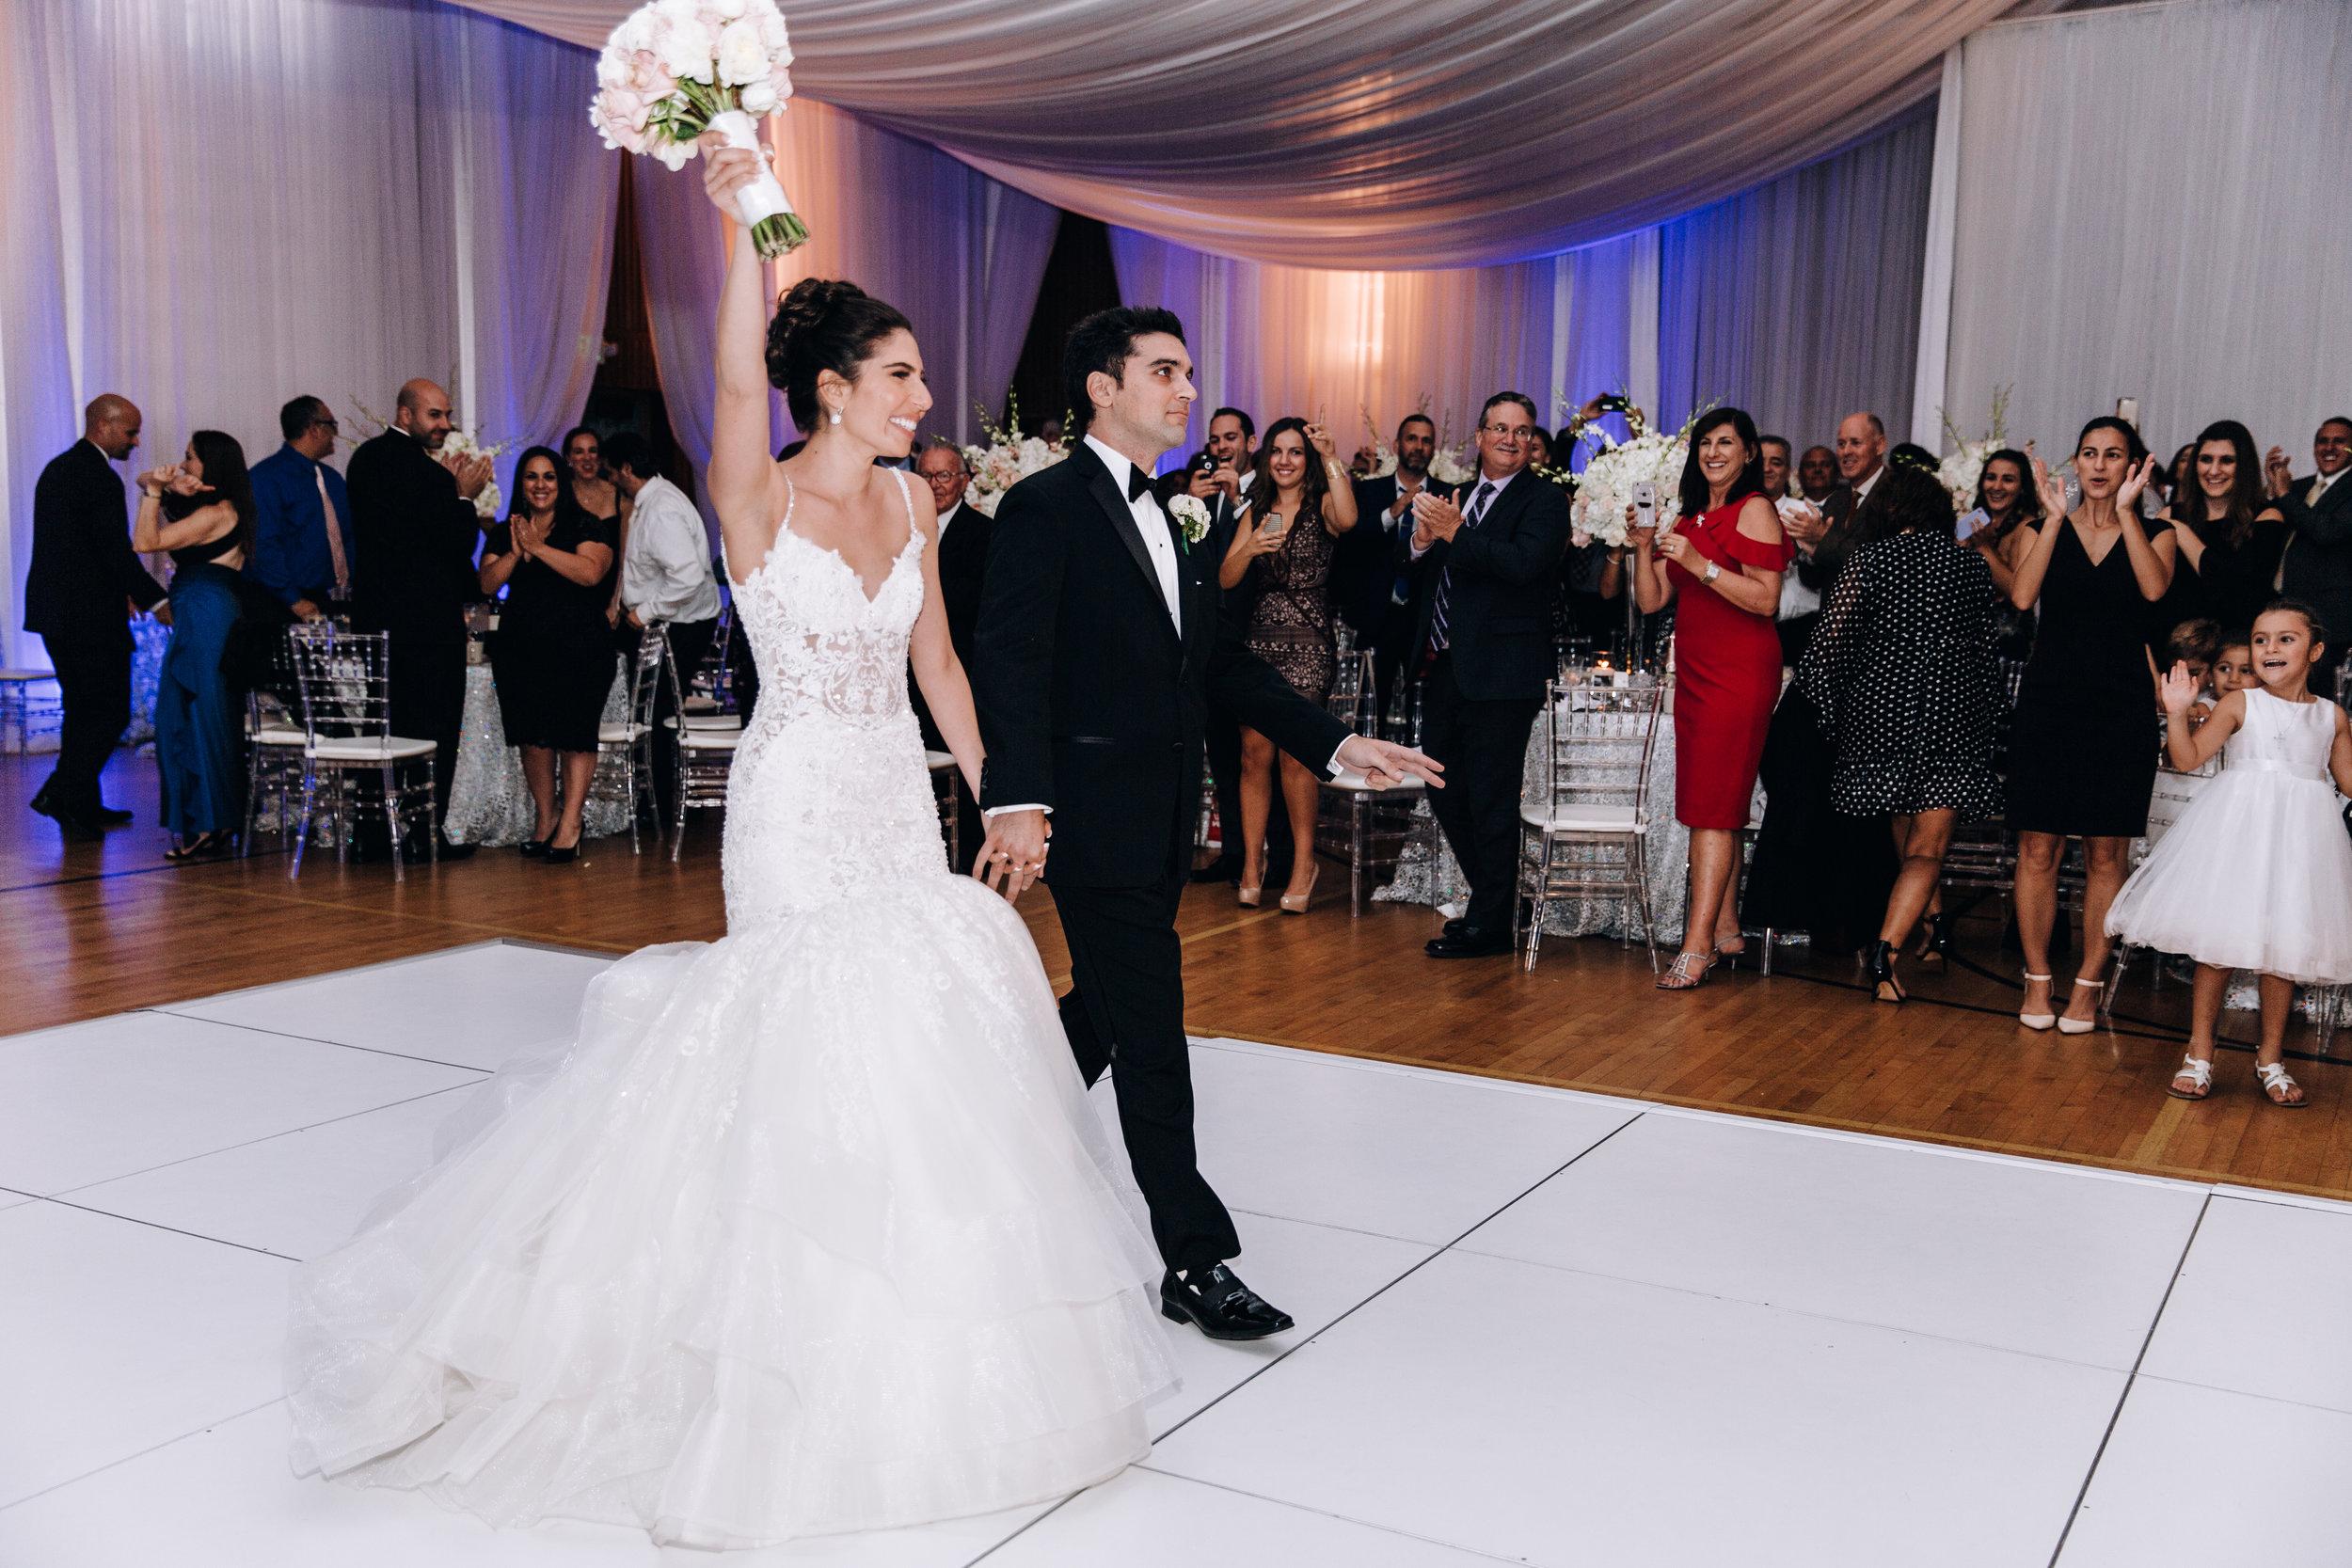 KaraNixonWeddings-GreekOrthodox-Oakland-Wedding-31.jpg